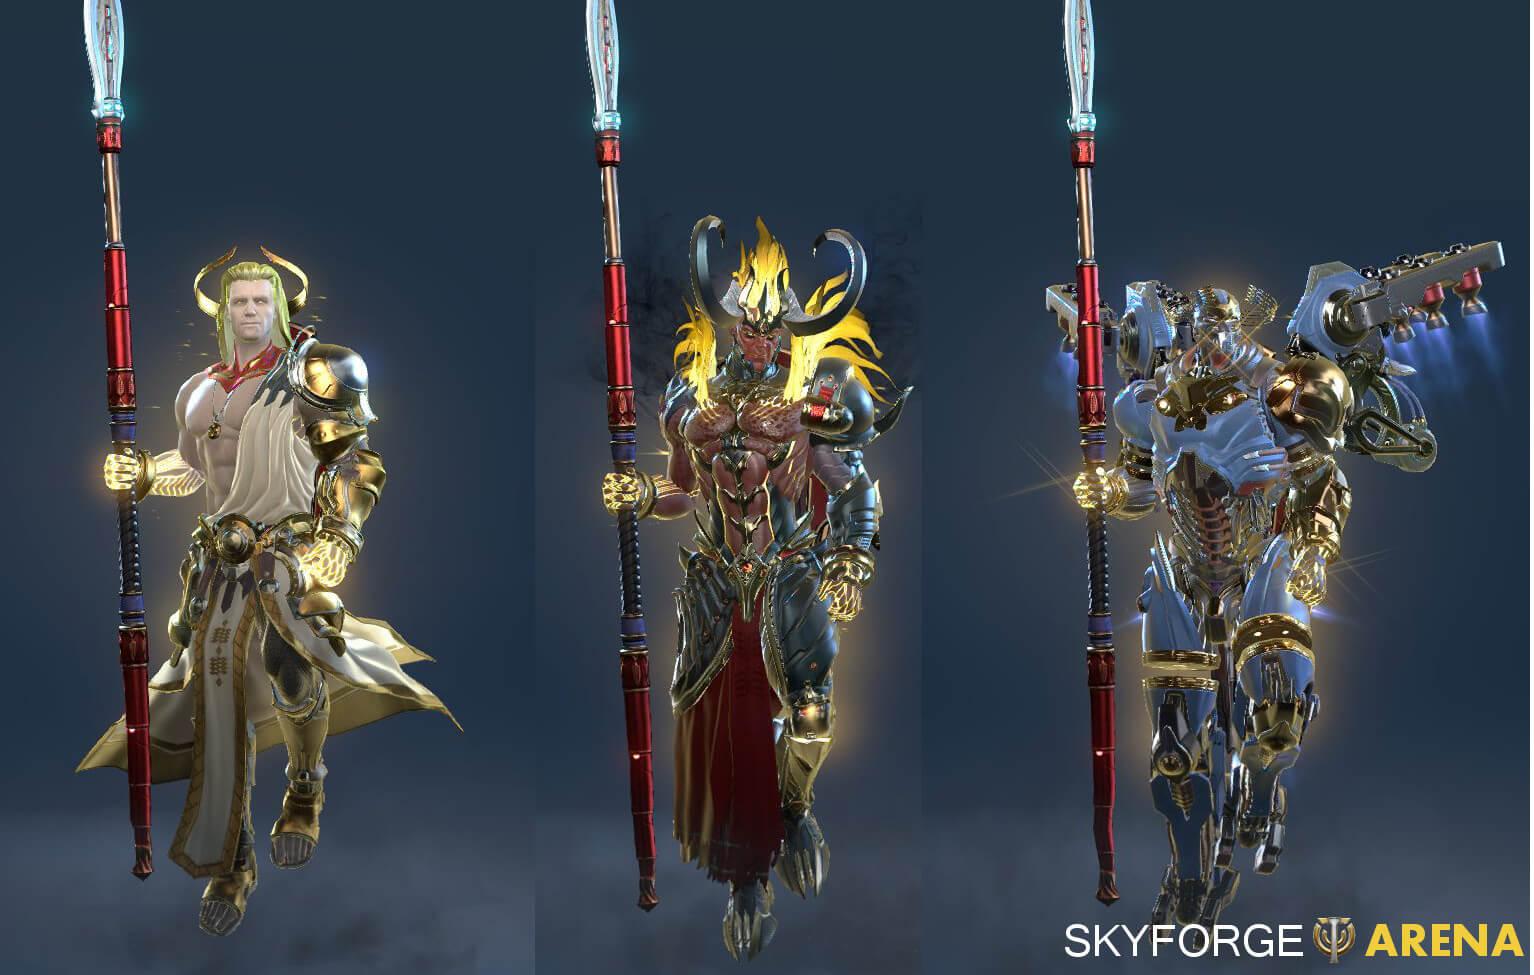 Becoming a God in Skyforge | Skyforge Arena